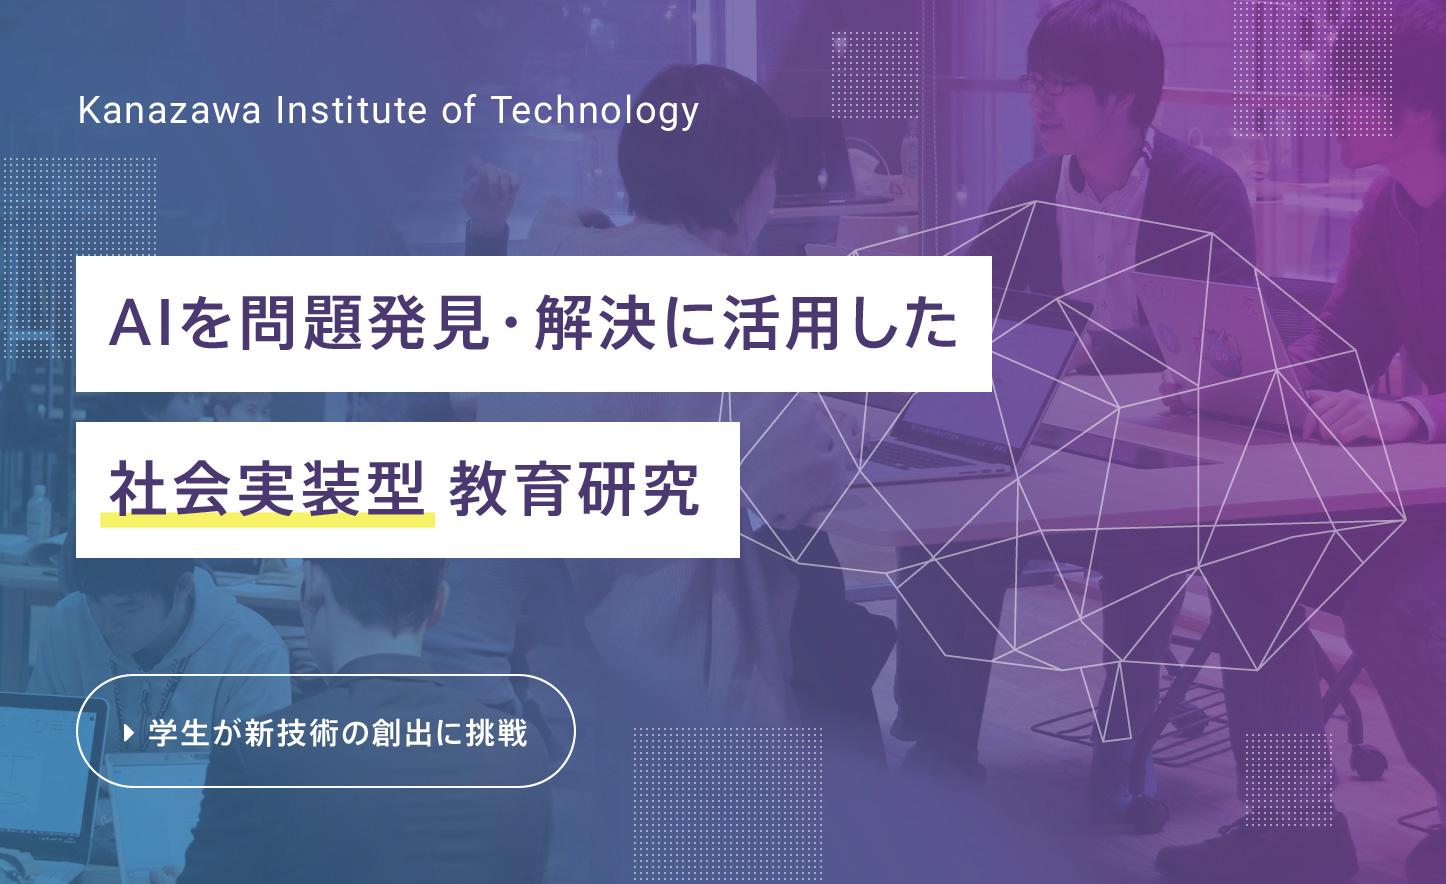 AIを問題発見・解決に活用したKITの社会実装型教育・研究